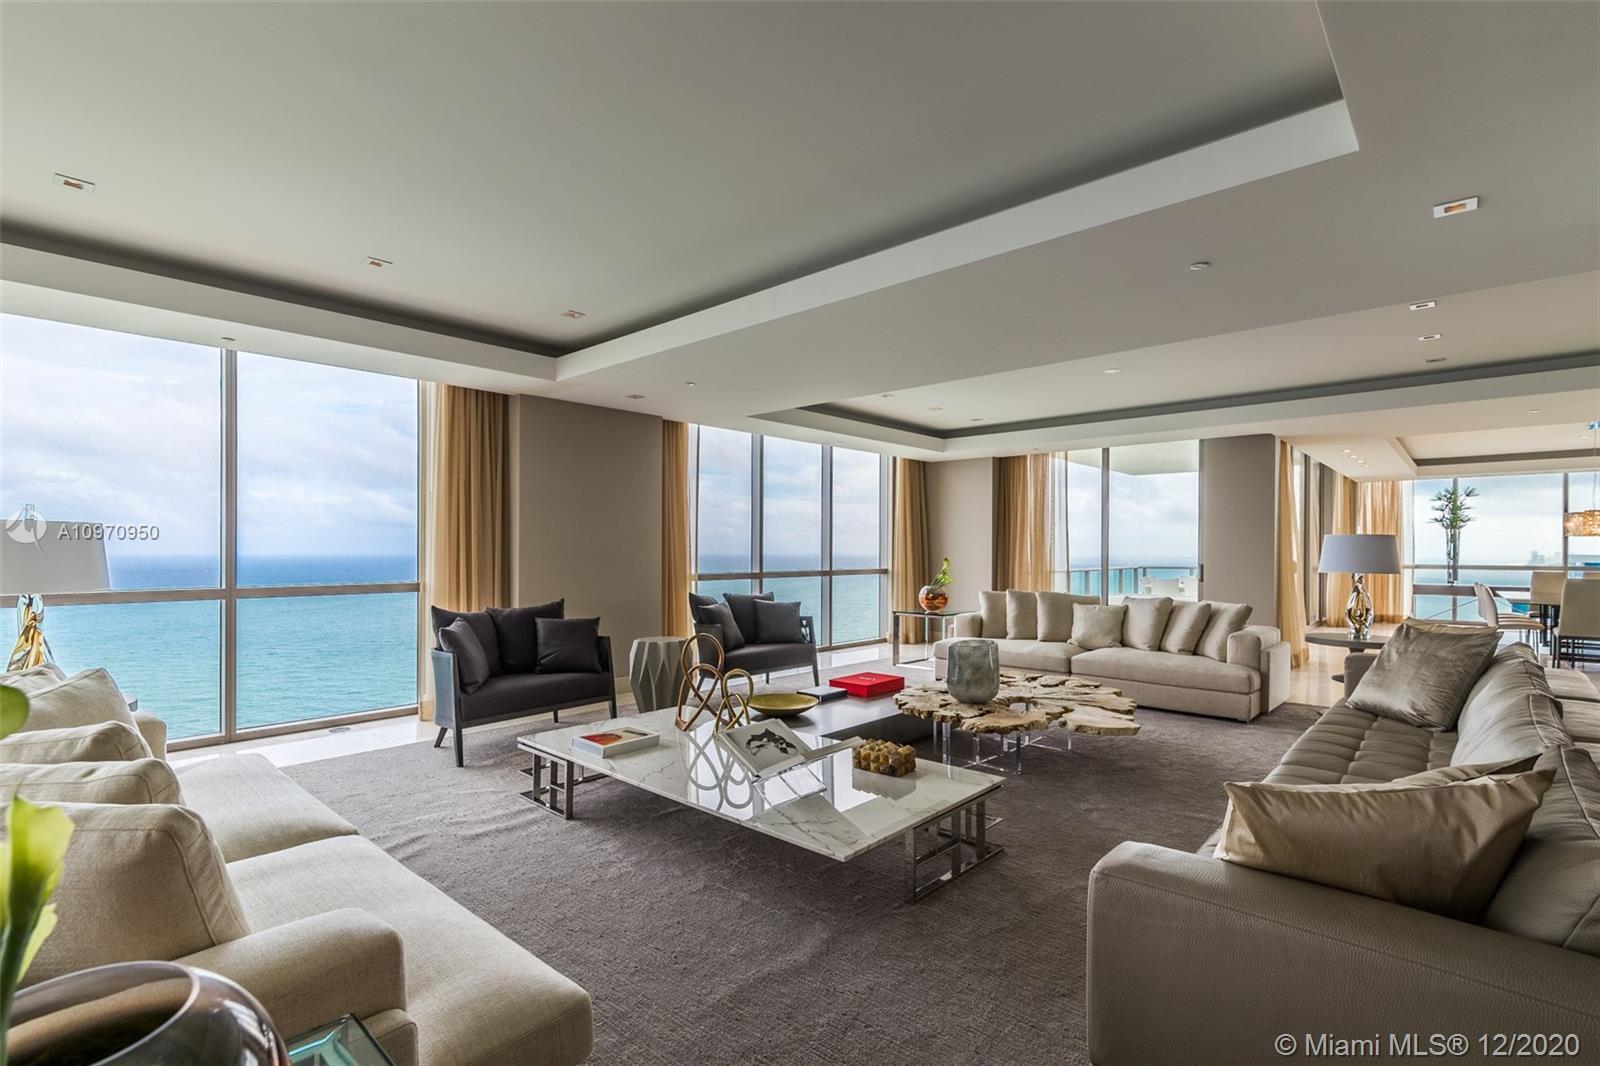 17749 Collins Av, Unit #3701/3702 Luxury Real Estate